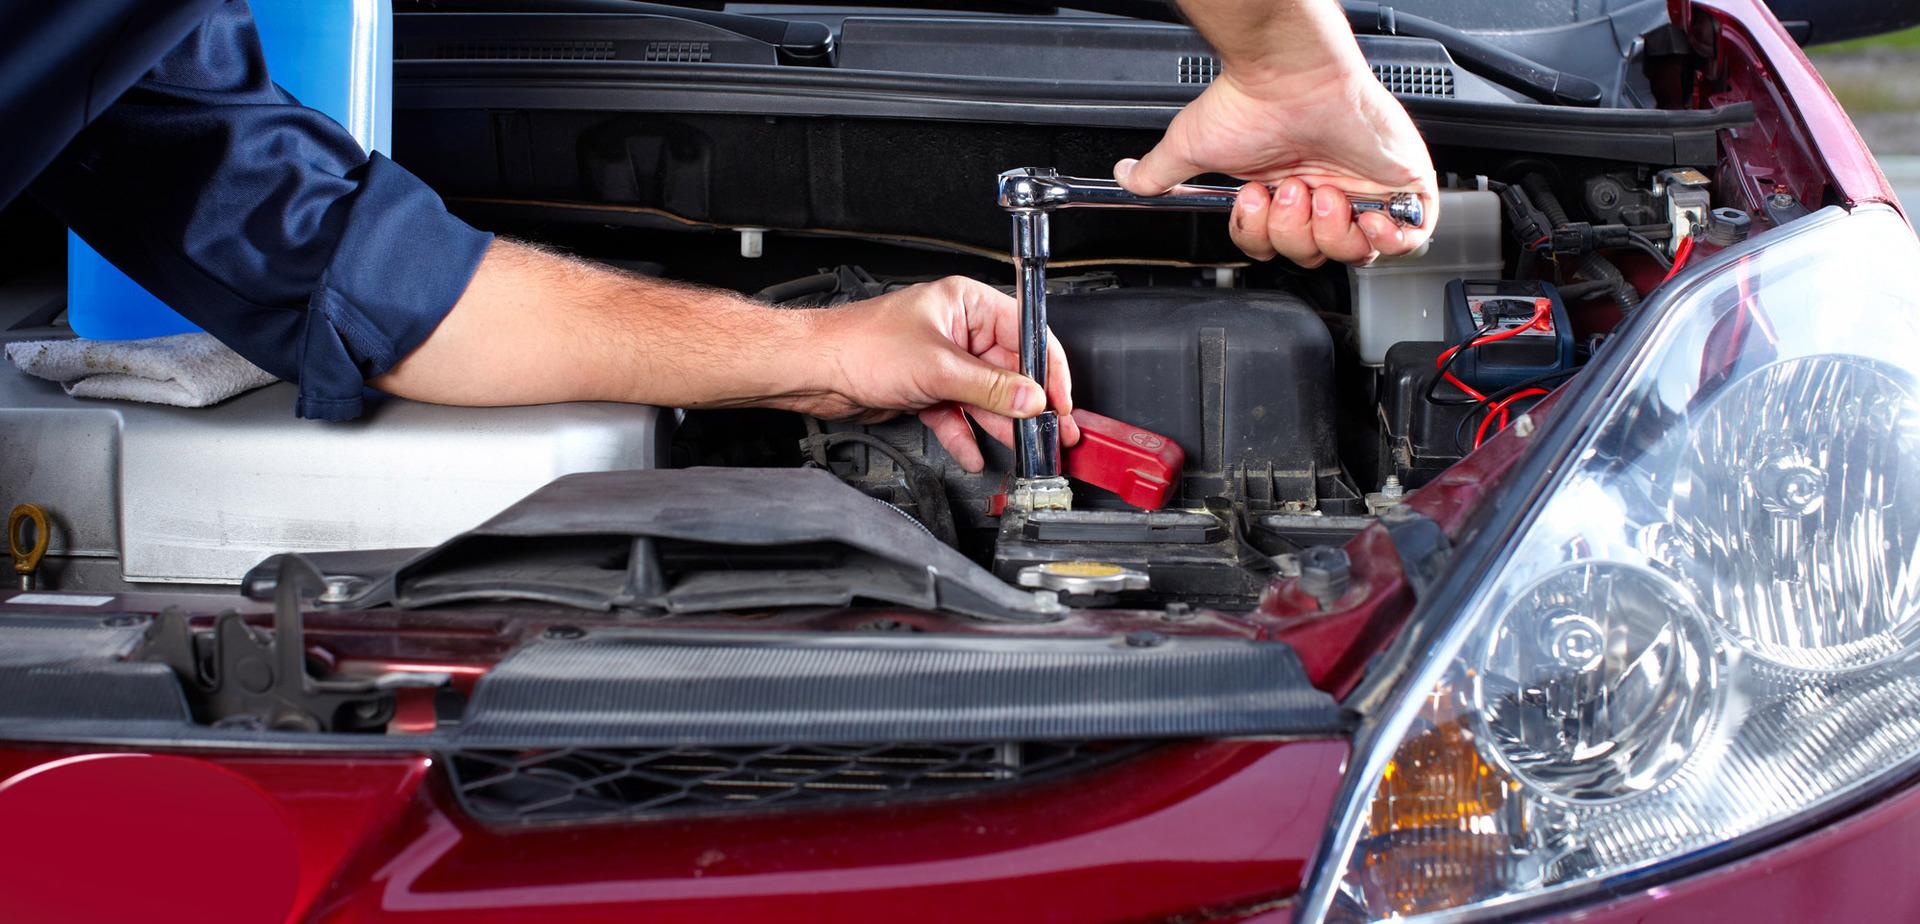 5 Tips To Choose A Car Dent Repair Specialist Car Repair Experts